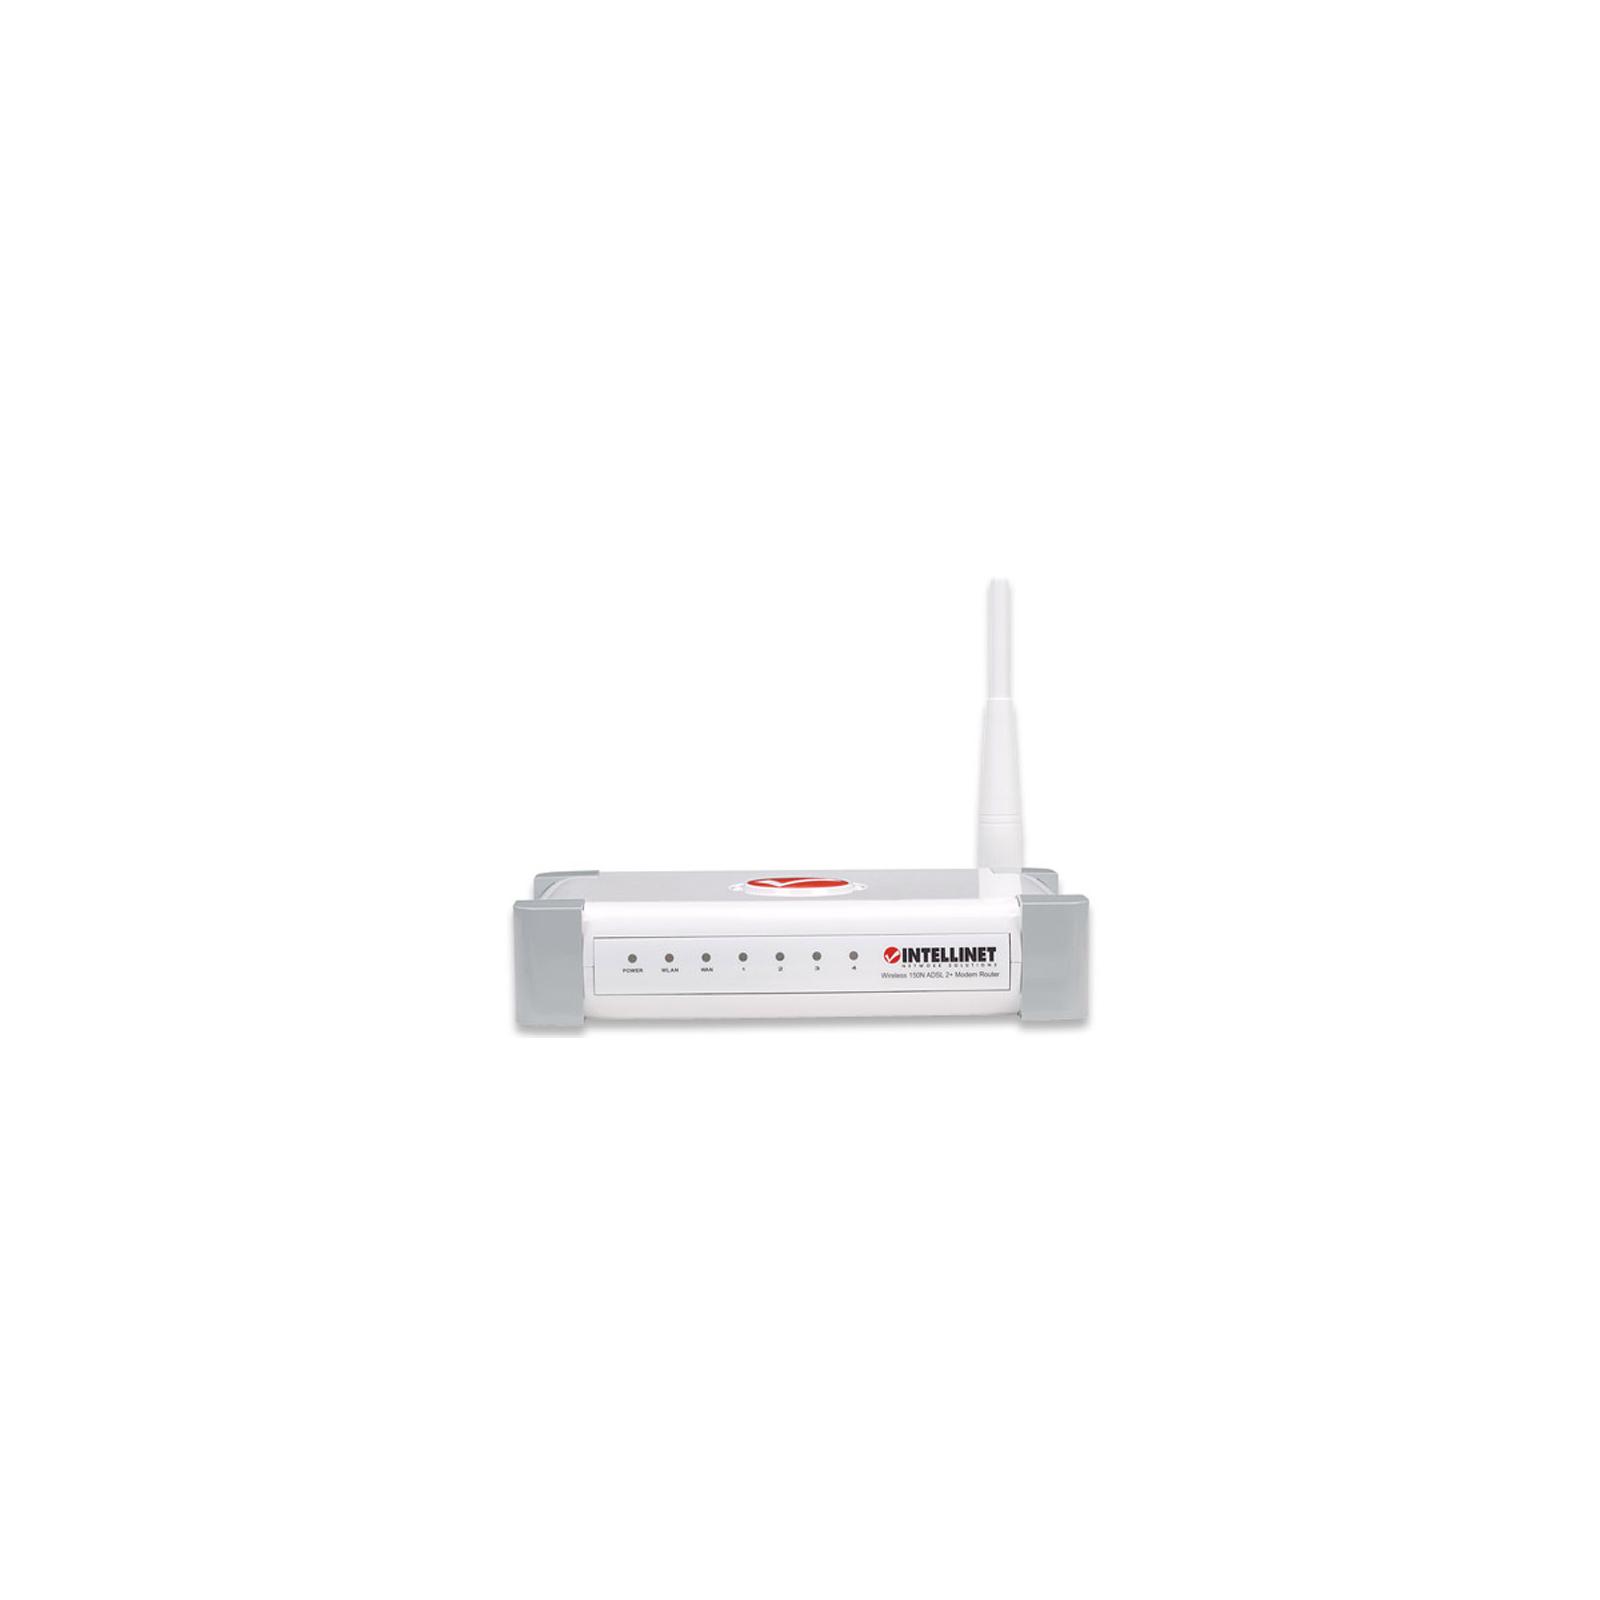 Маршрутизатор Intellinet 150N ADSL2+ Modem Router изображение 2